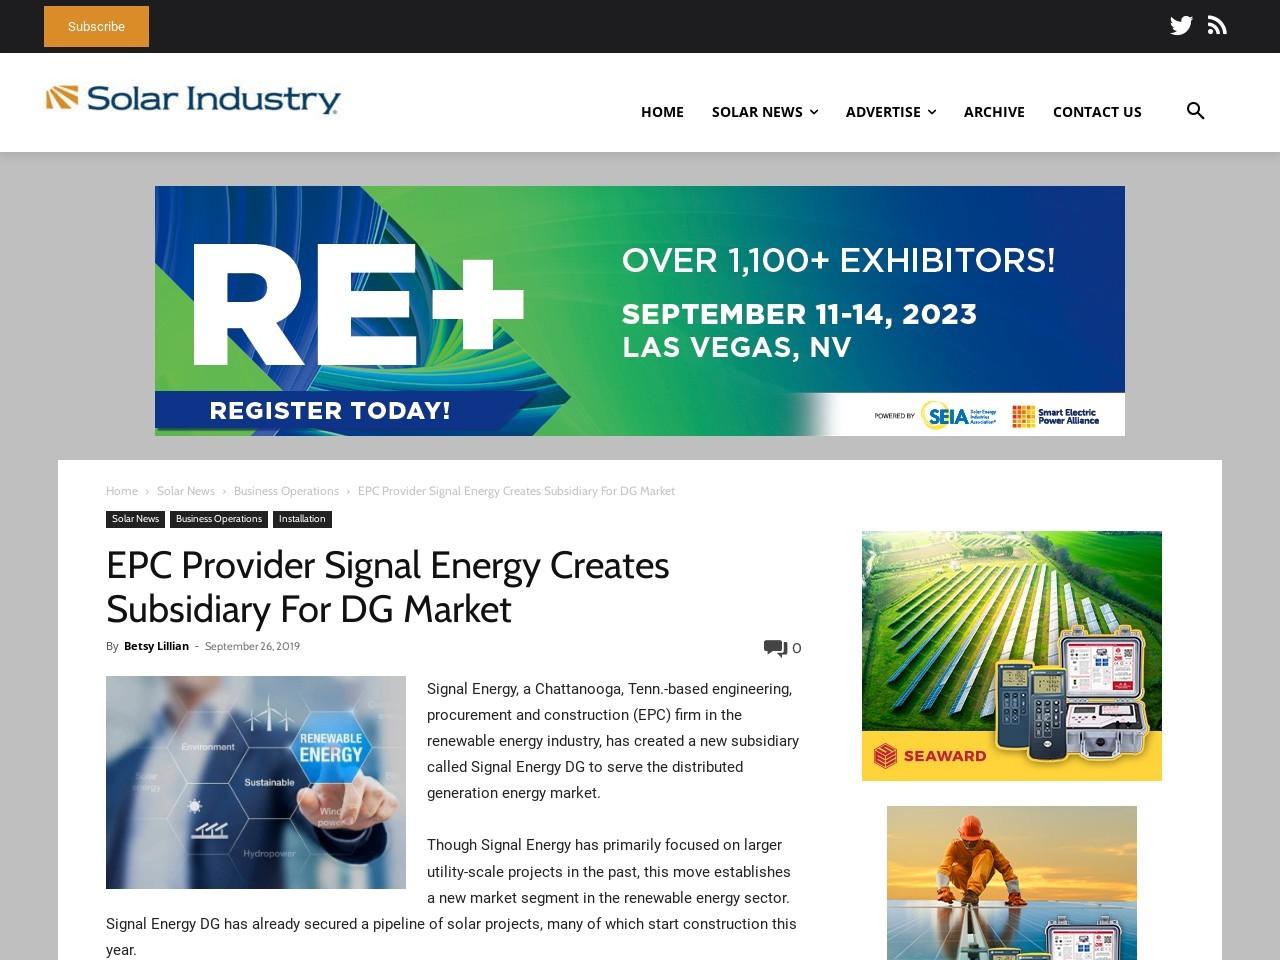 EPC Provider Signal Energy Creates Subsidiary For DG Market